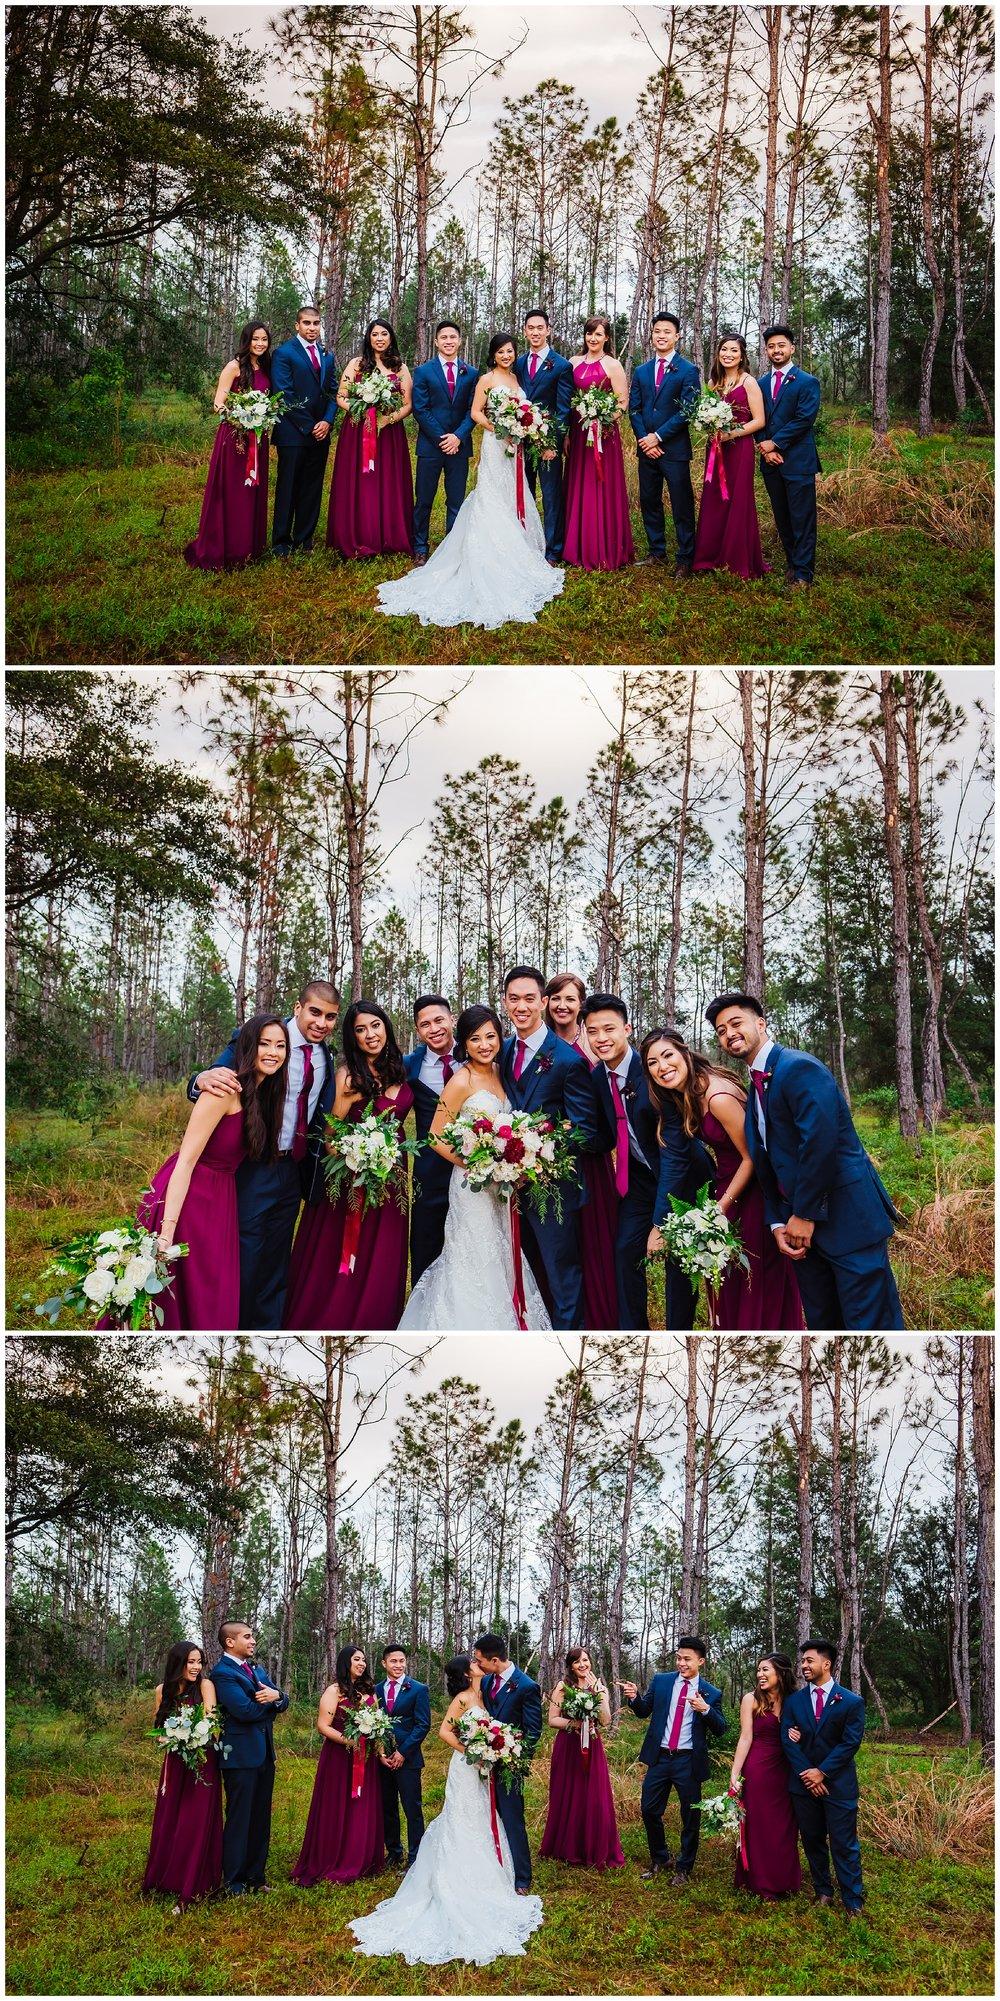 tampa-wedding-photographer-philipino-colorful-woods-ballroom-church-mass-confetti-fuscia_0045.jpg